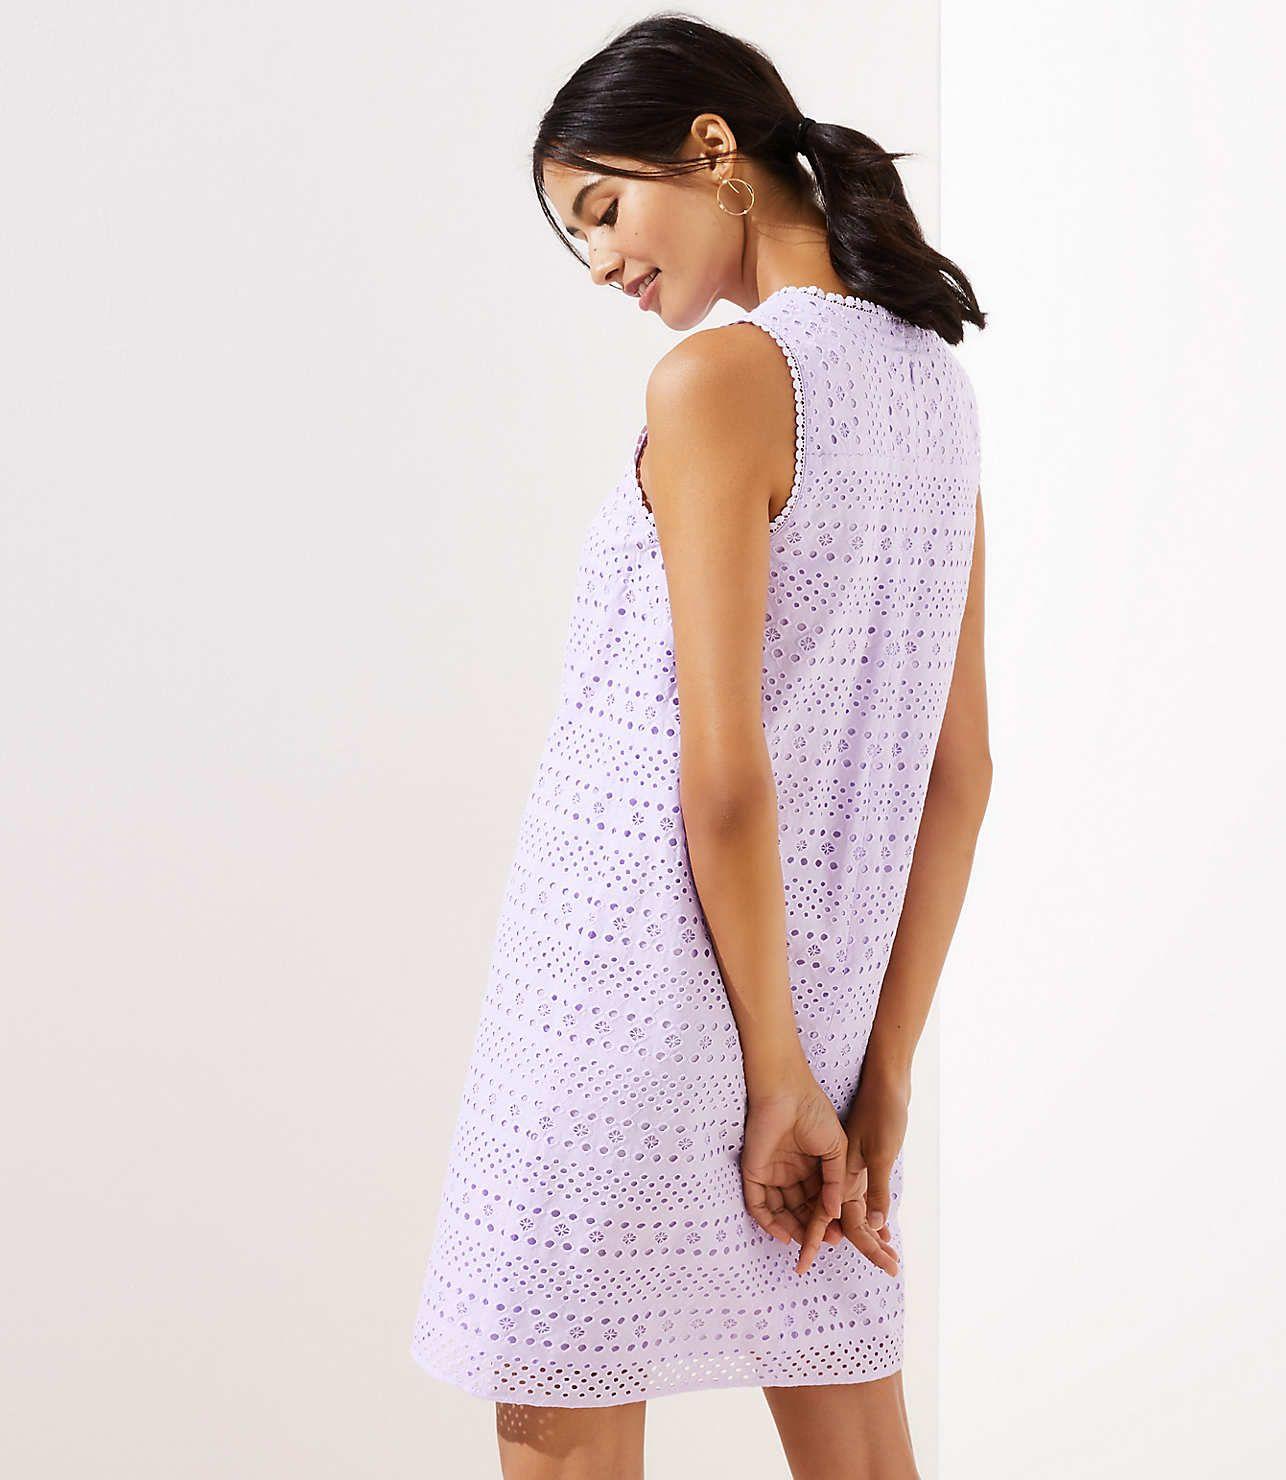 Striped Eyelet Shift Dress Loft Shift Dress Dresses Shoulder Dress [ 1480 x 1286 Pixel ]